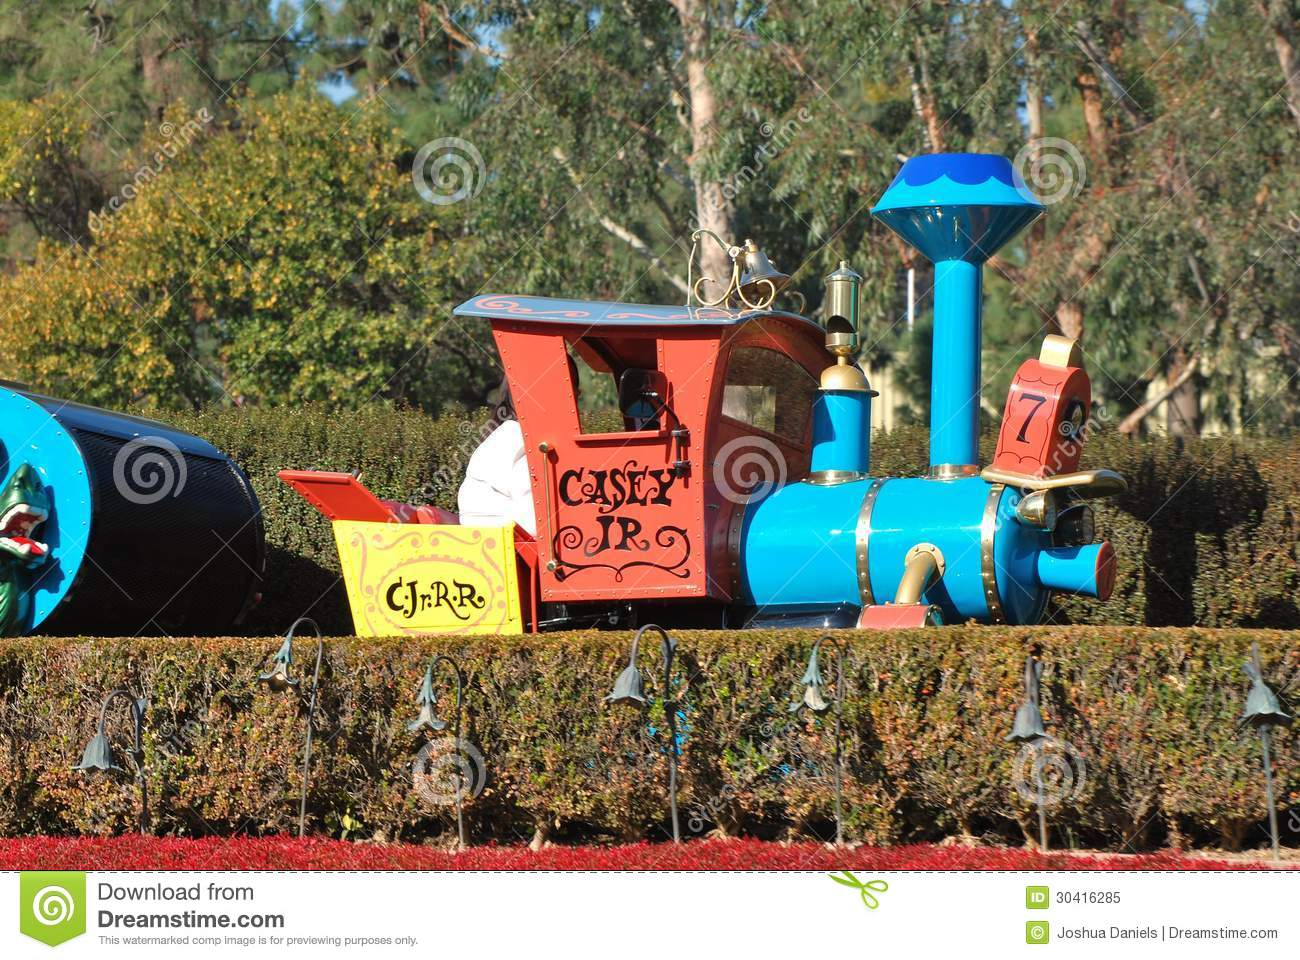 Casey Jr. Train Attraction Riding Through Disneyland, California.